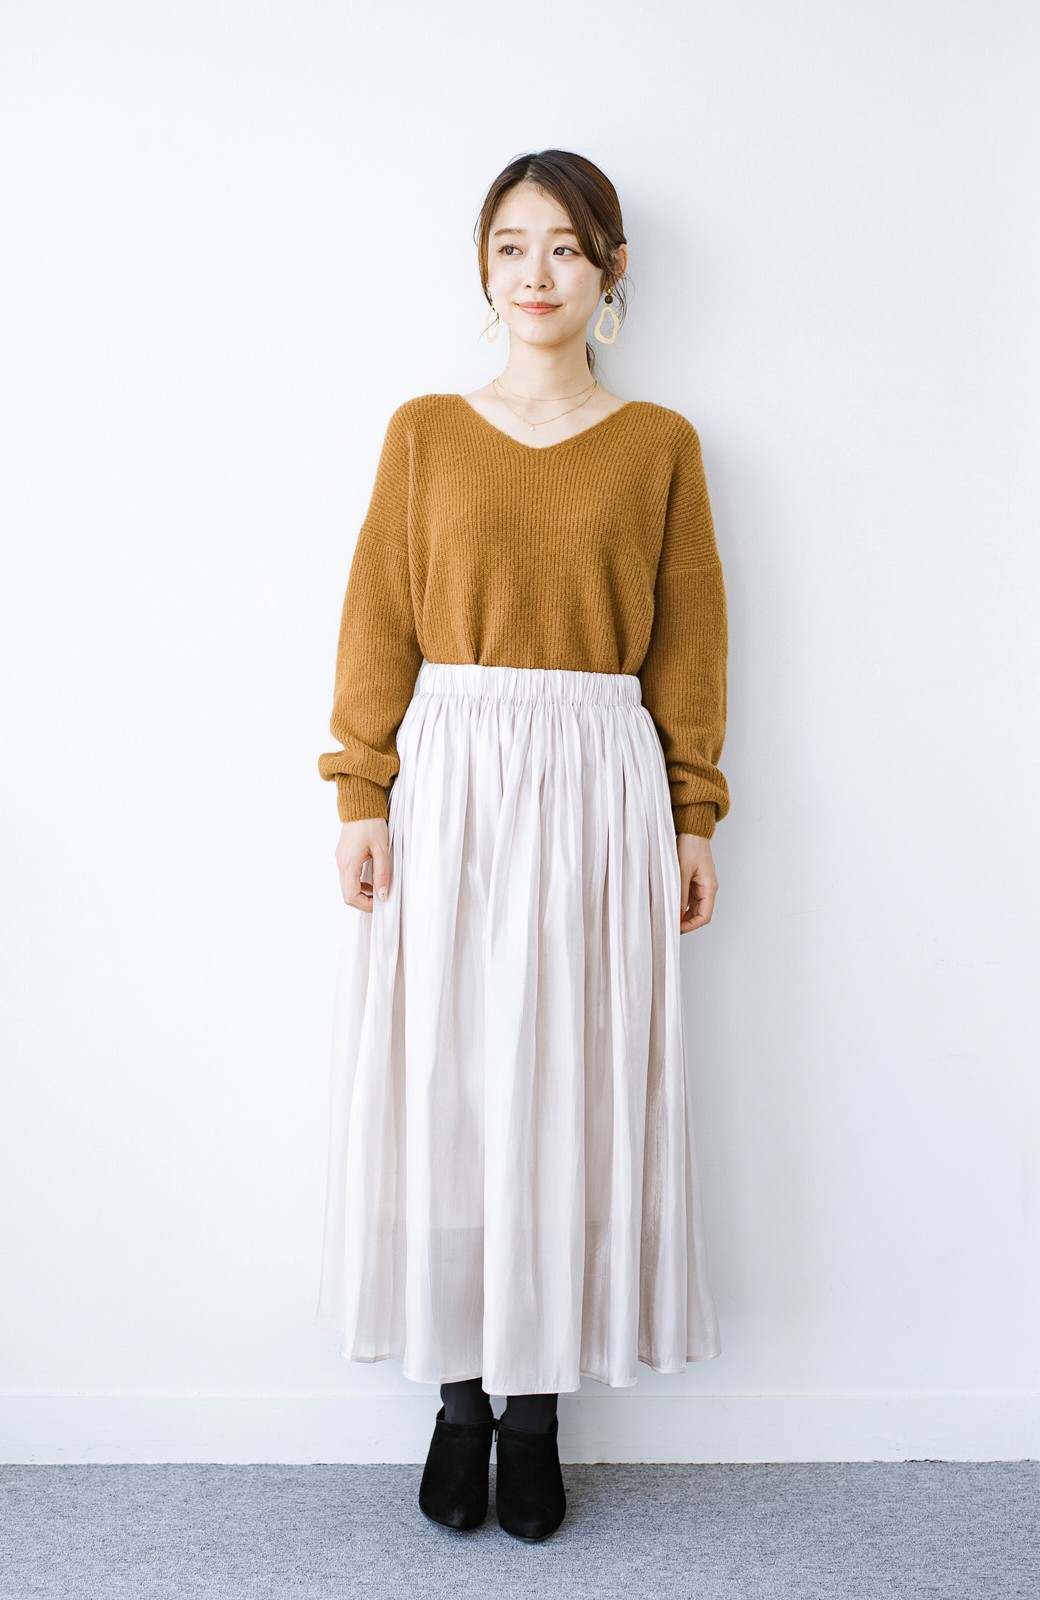 haco! 【人気のため新色追加!】1枚でも重ね着にも便利なキラキラ素材がかわいいロングスカート by laulea <アイボリー>の商品写真13